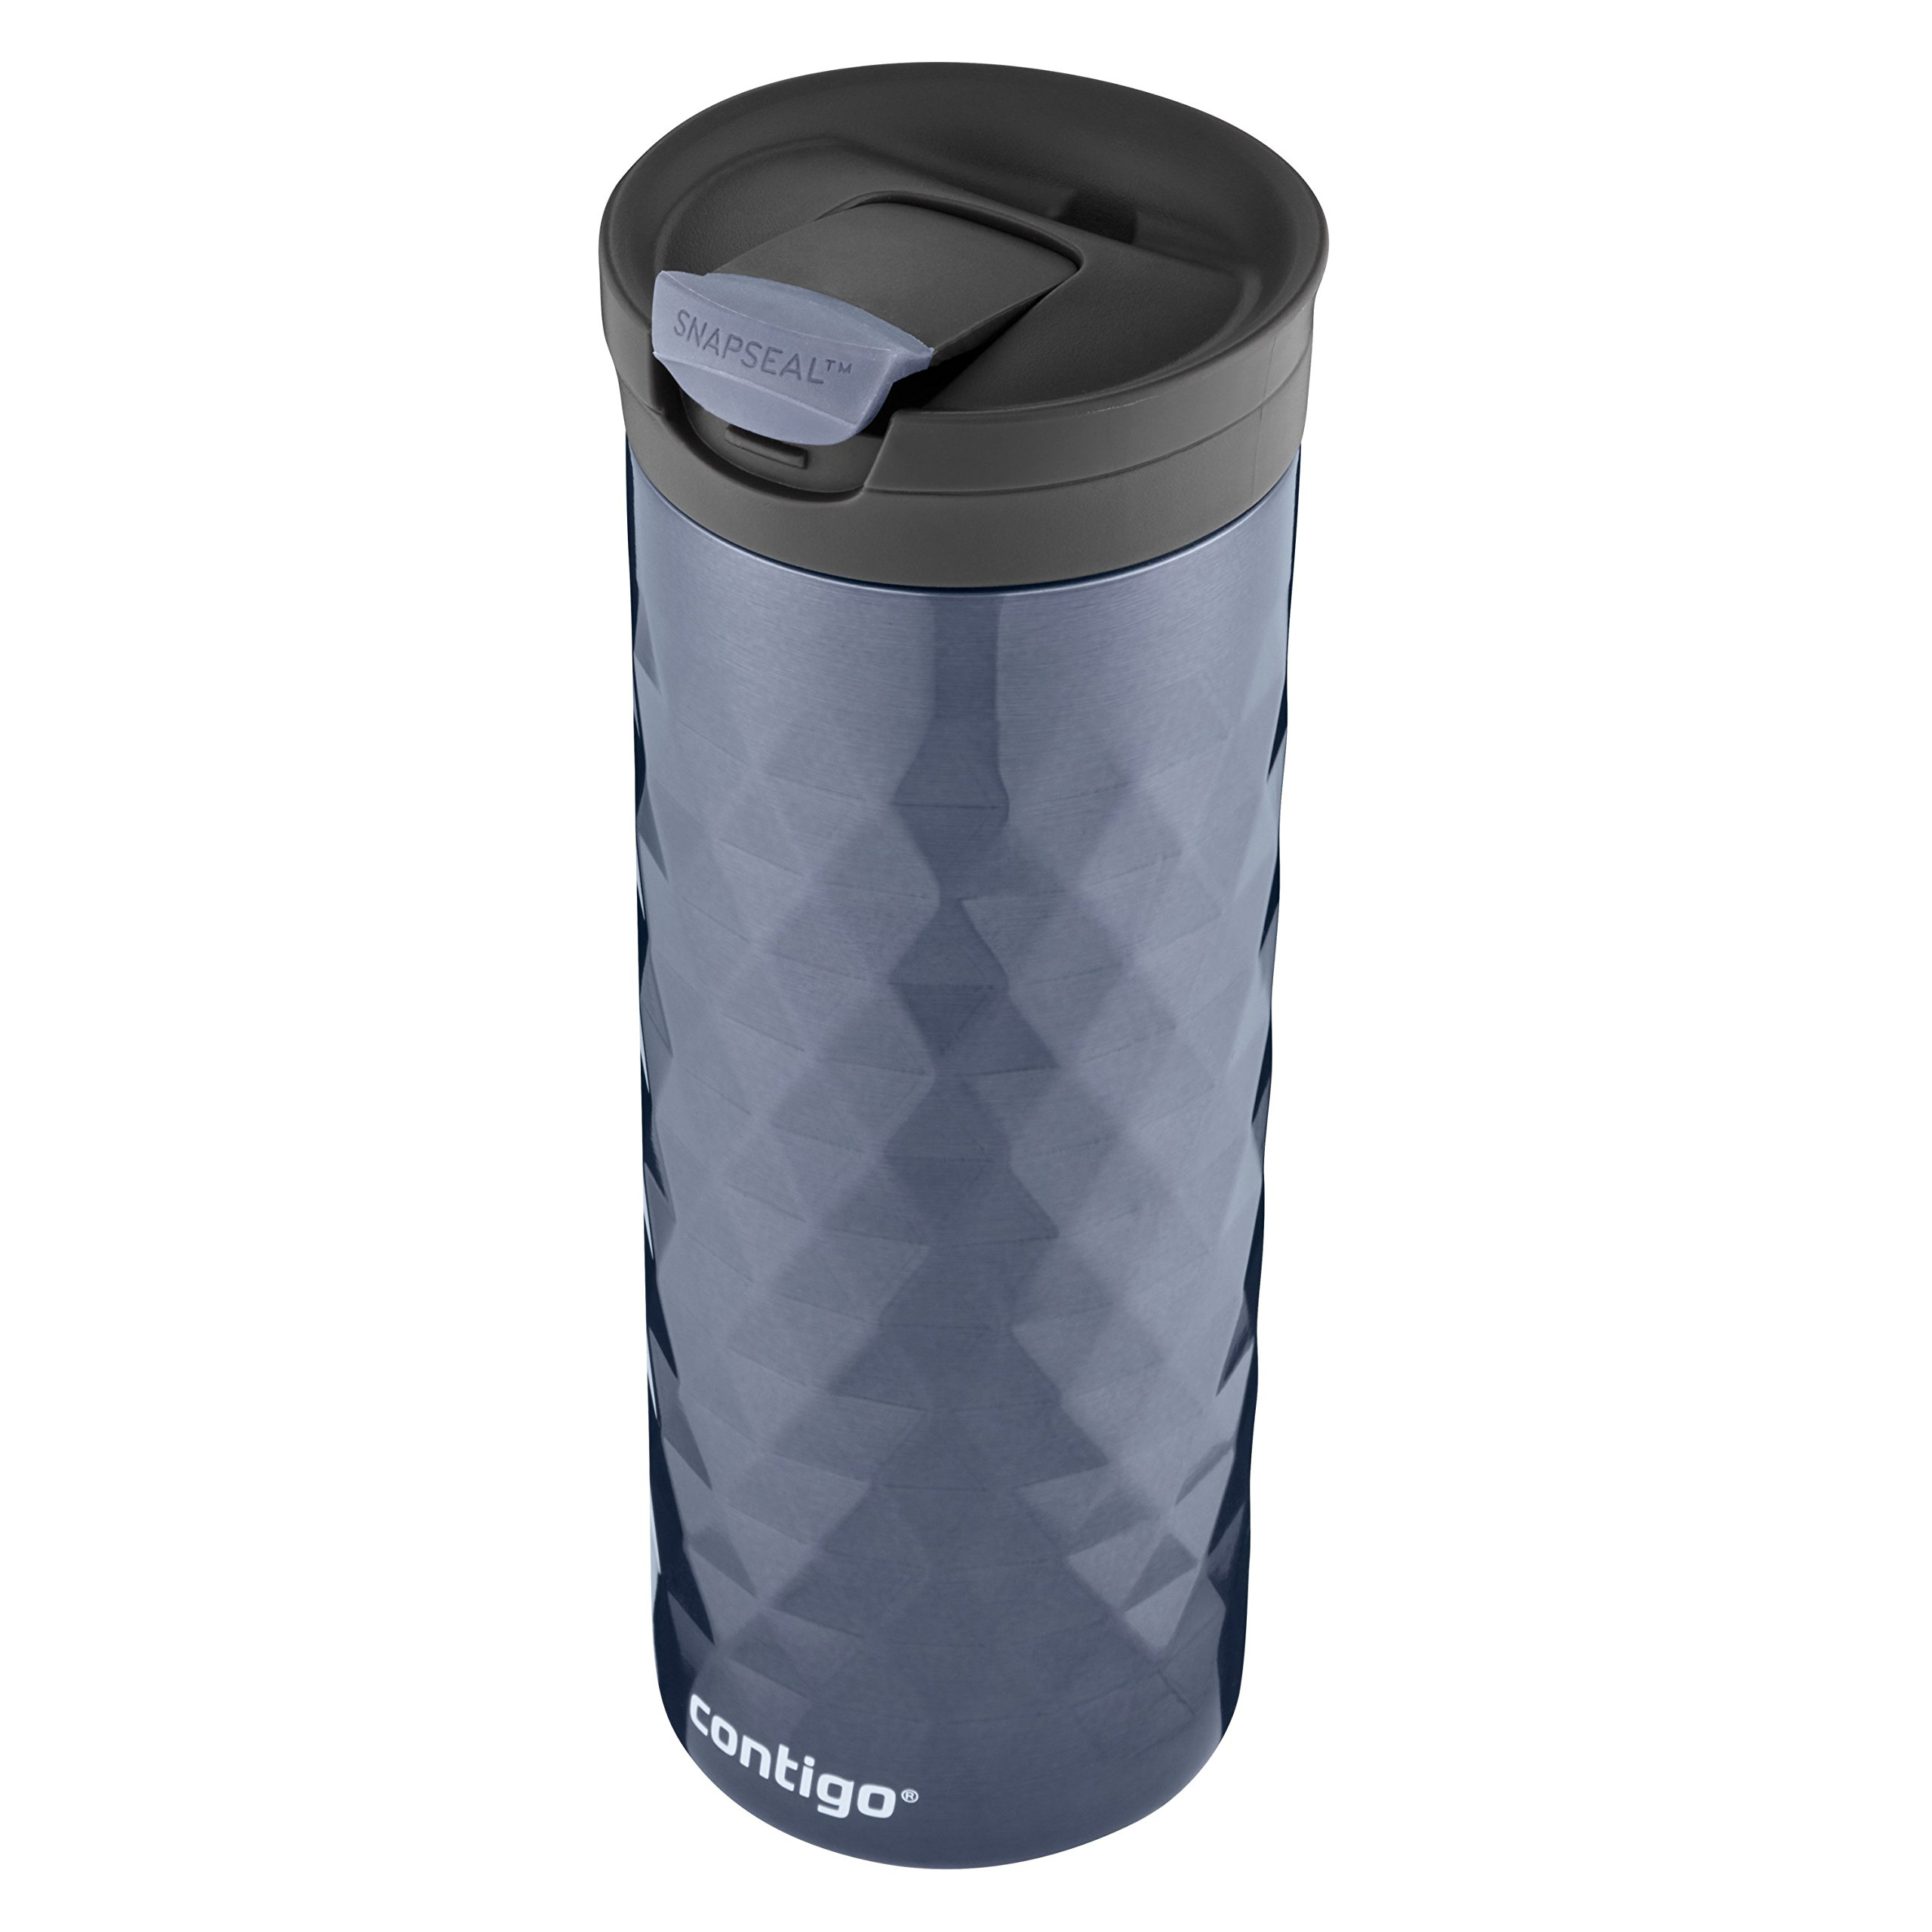 Contigo SnapSeal Kenton Stainless Steel Travel Mug, 20 oz, Serenity by Contigo (Image #4)